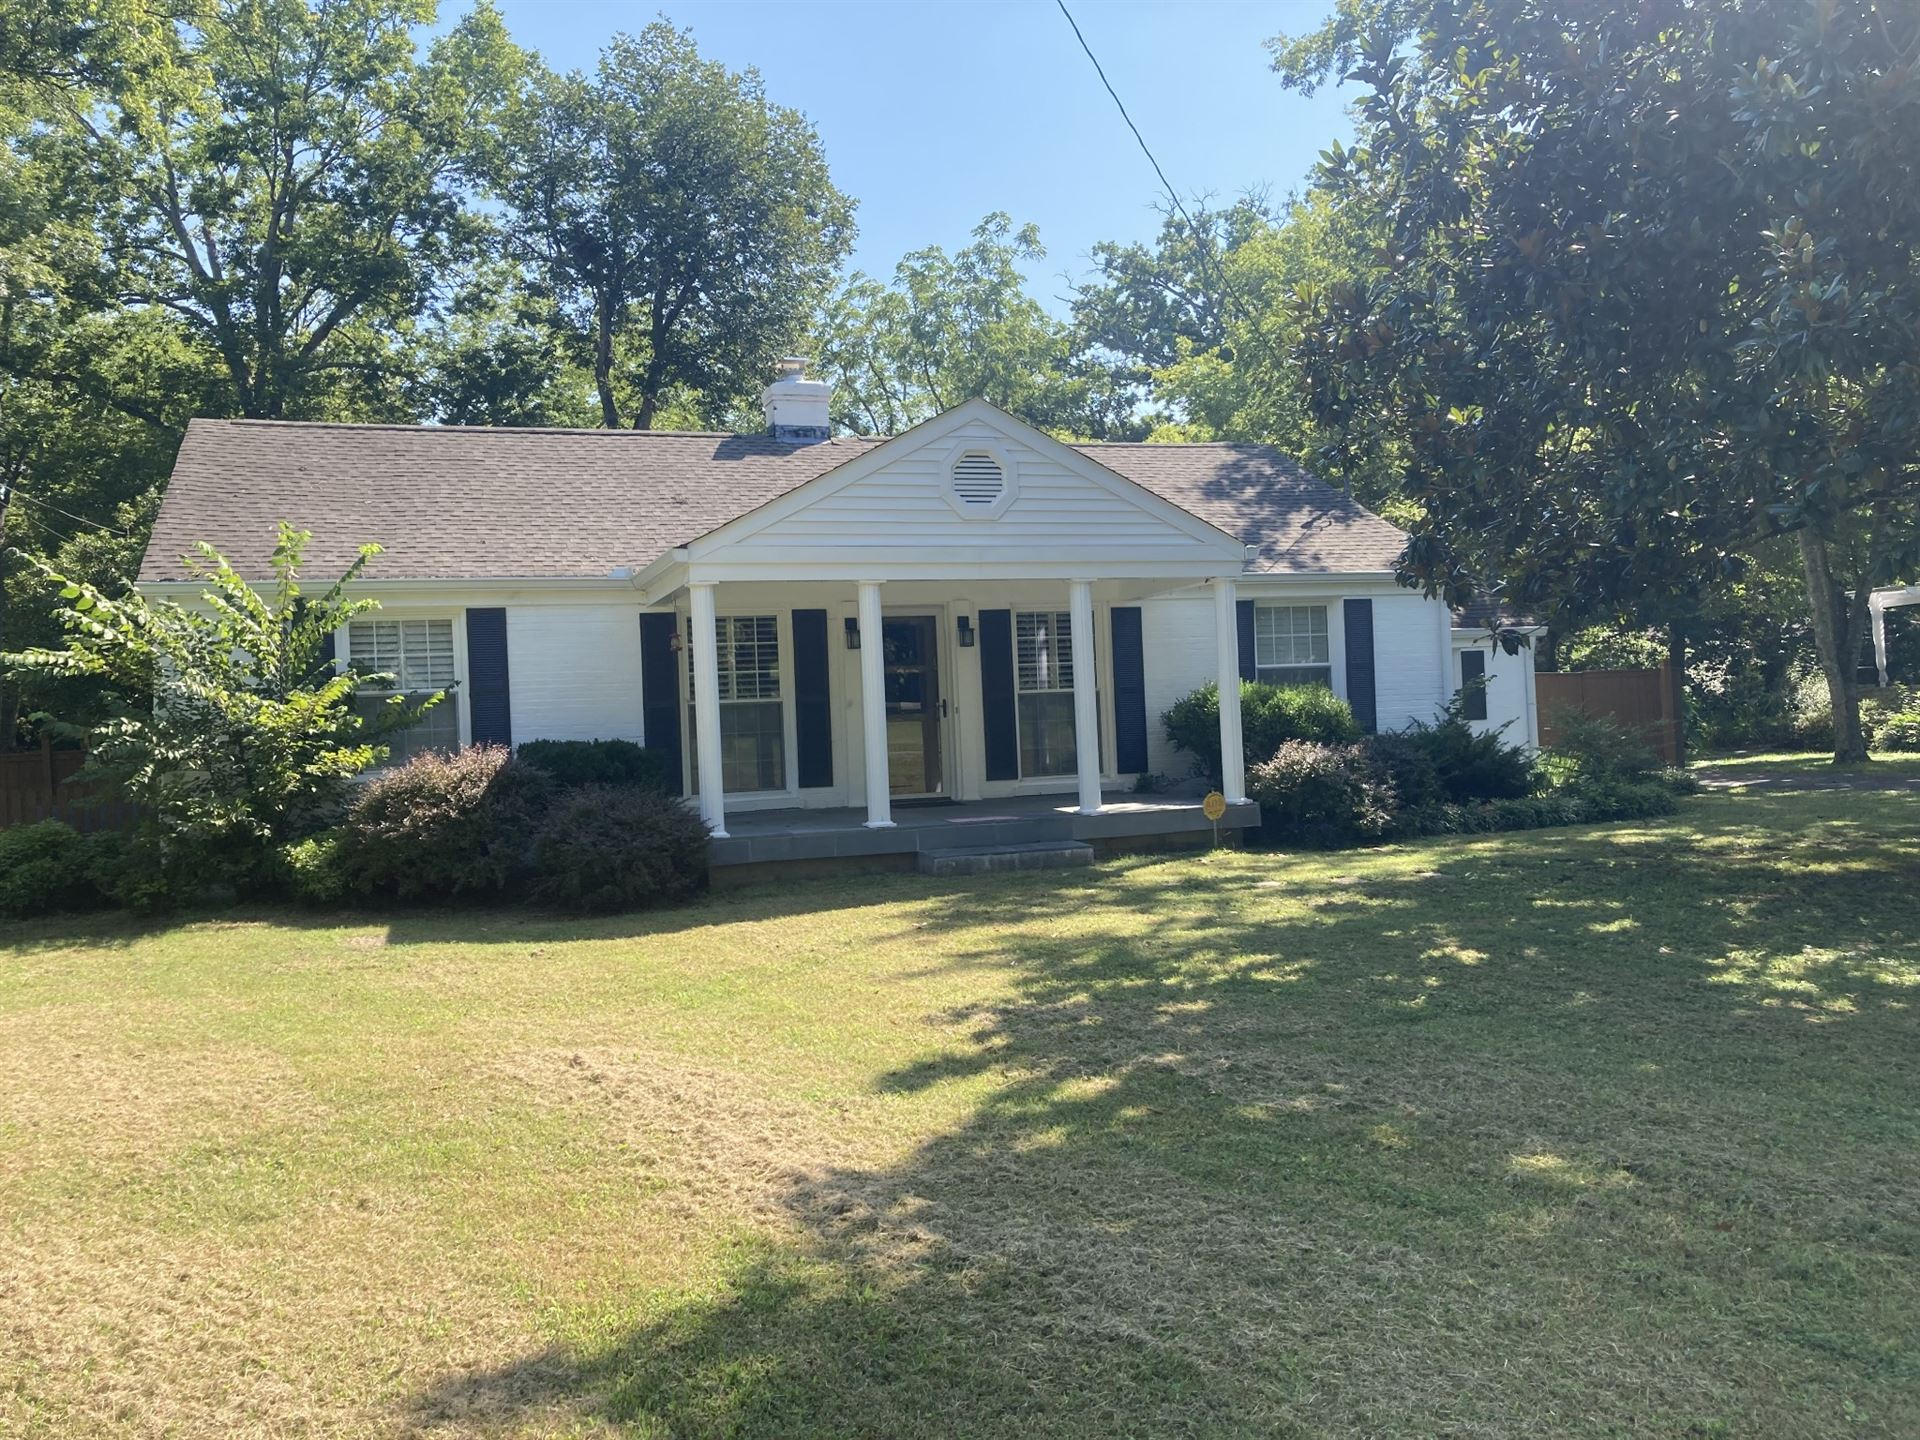 Photo of 2812 Sugartree Rd, Nashville, TN 37215 (MLS # 2282887)